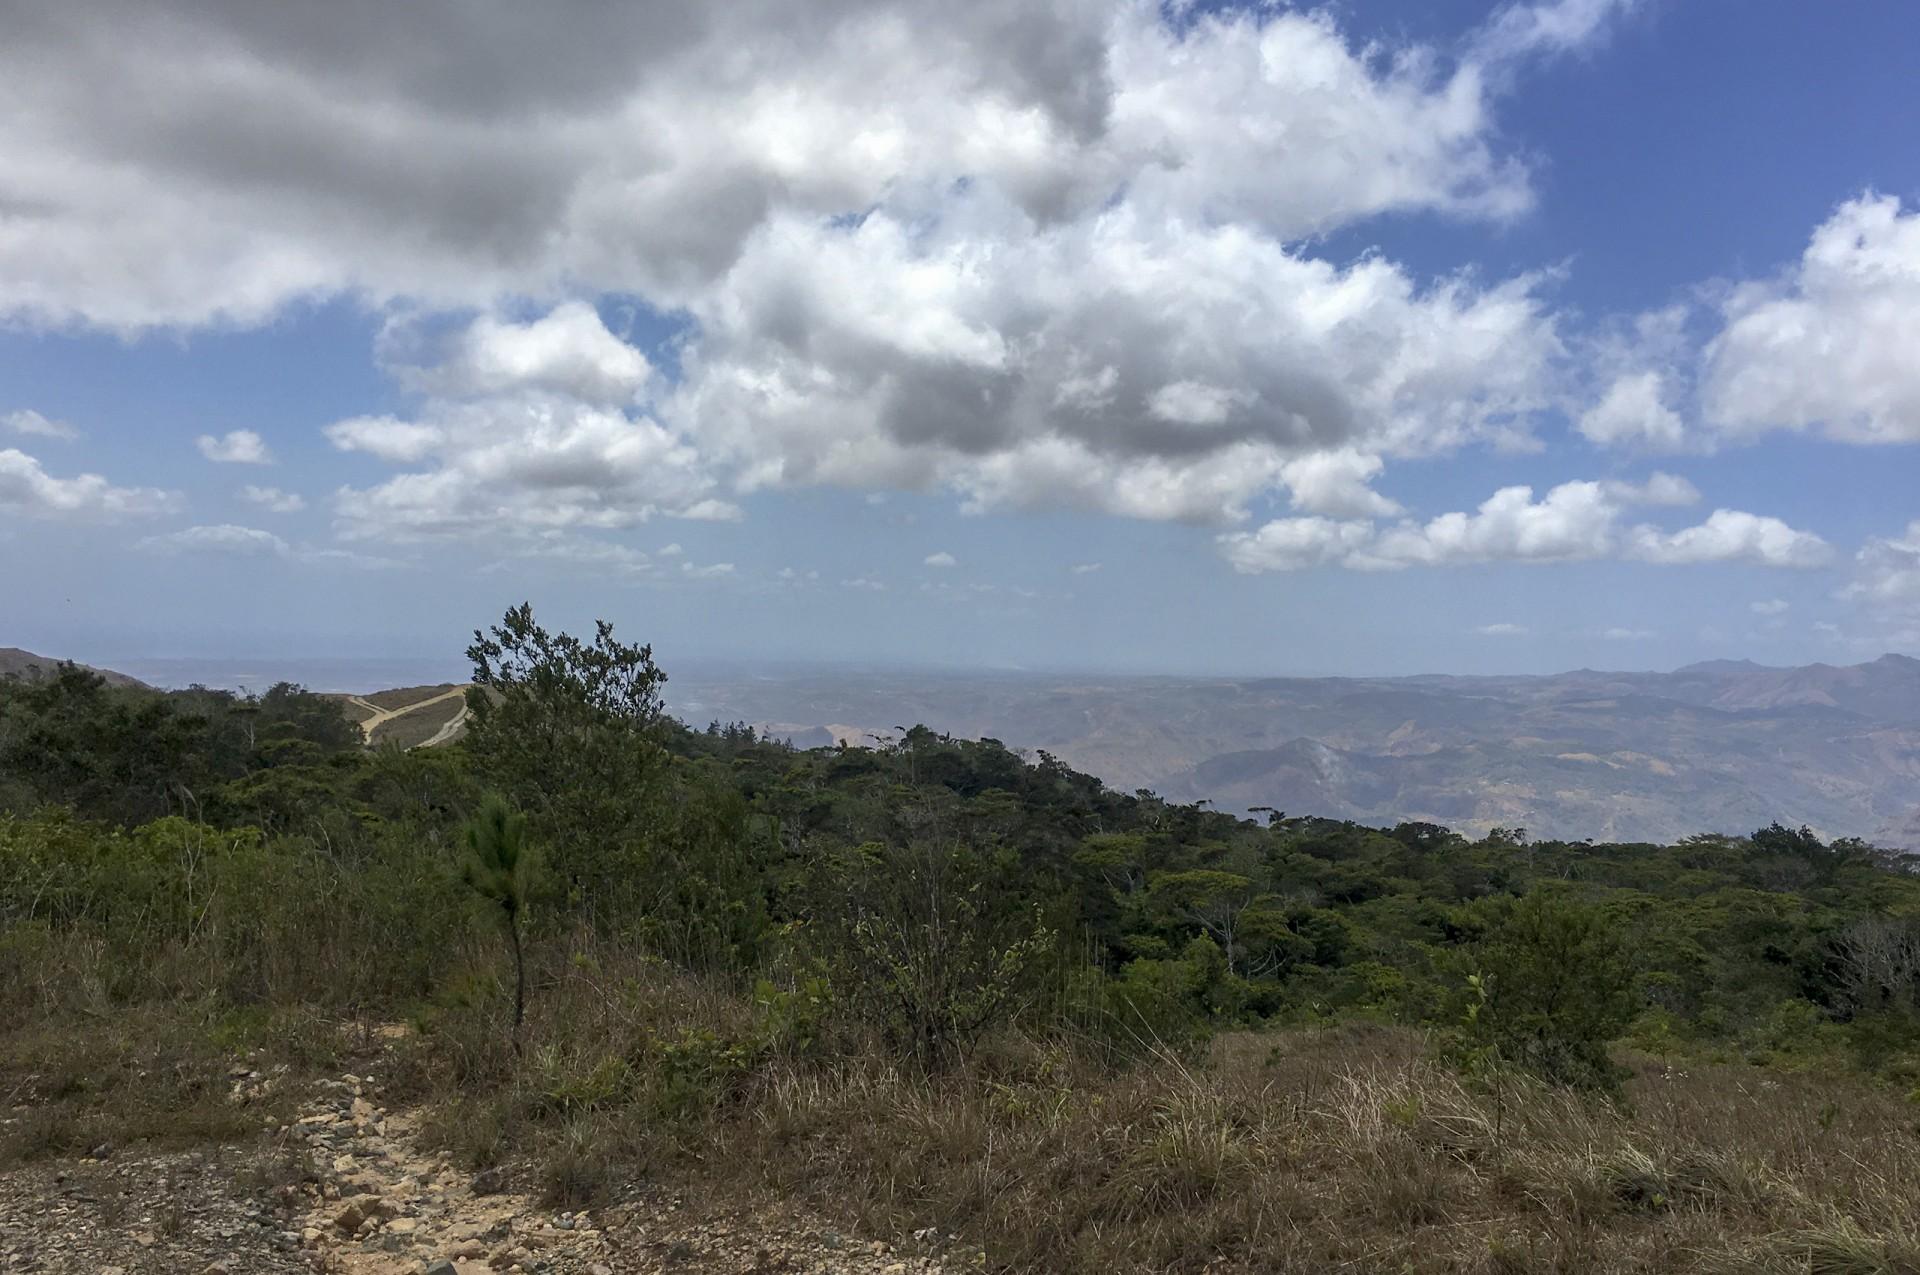 cloud_habitat_slideshow